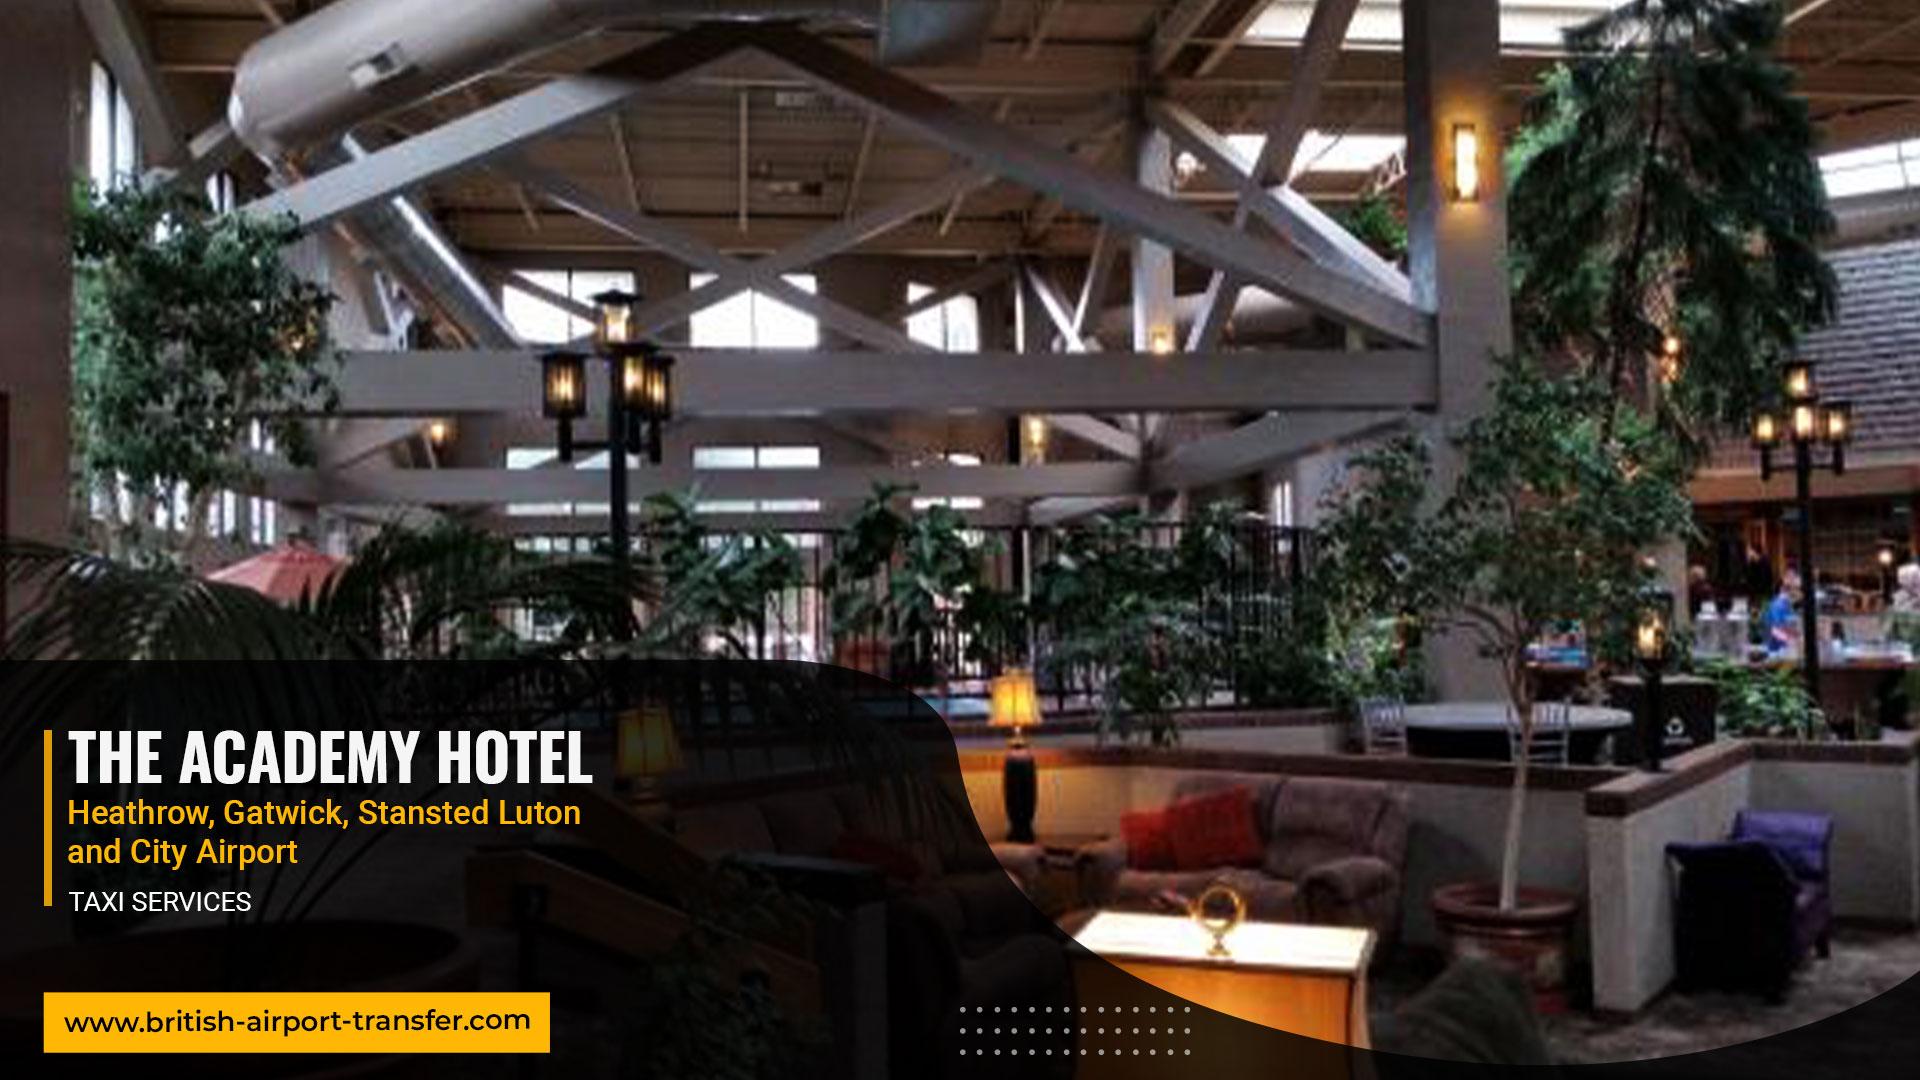 Taxi Service – The Academy Hotel / WC1E 6HG